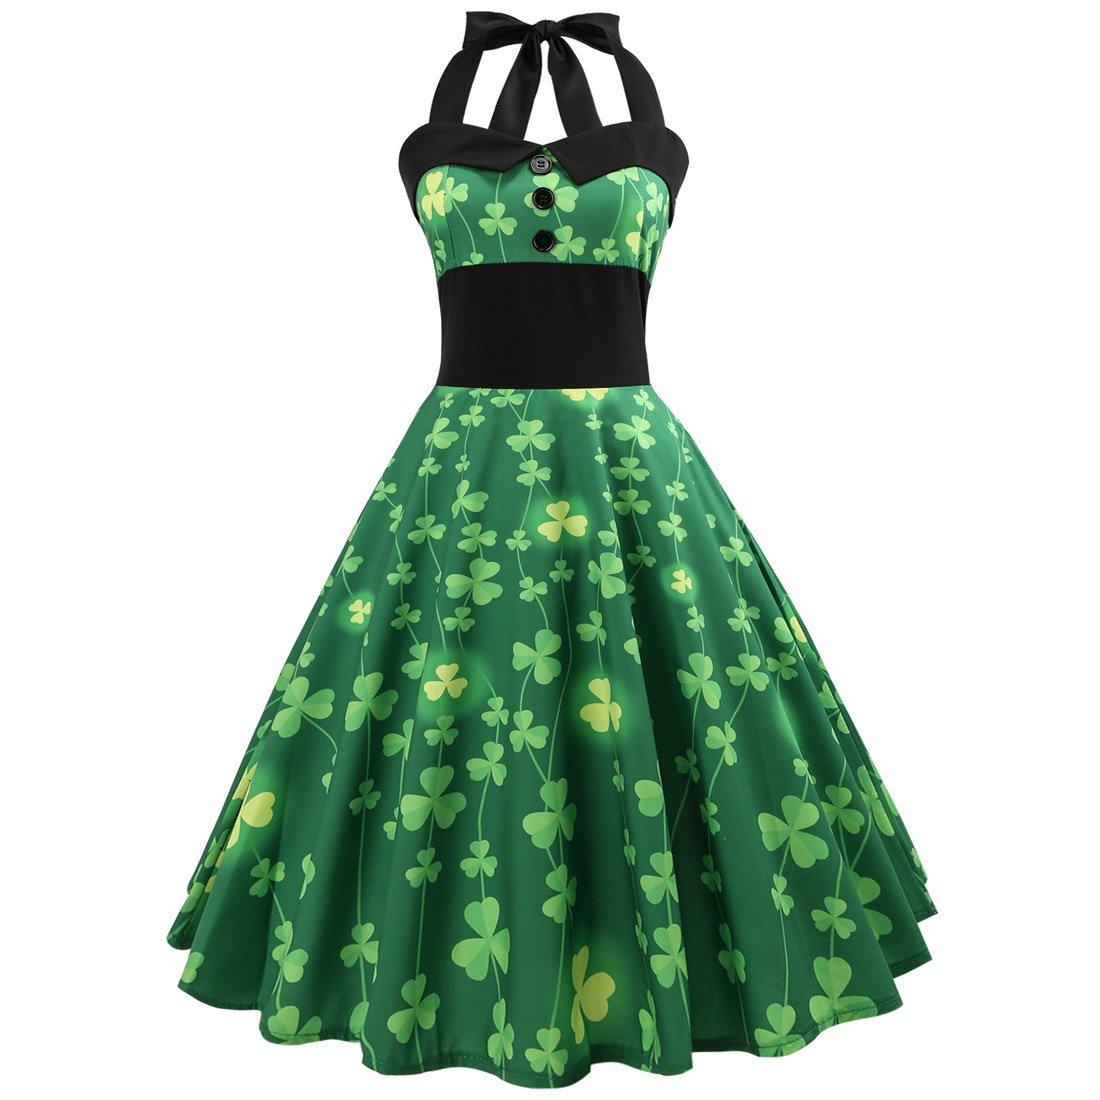 St. Patrick's Day Vintage Party Dresses Shamrocks Printed Plus Size Halter Retro Midi Dresses